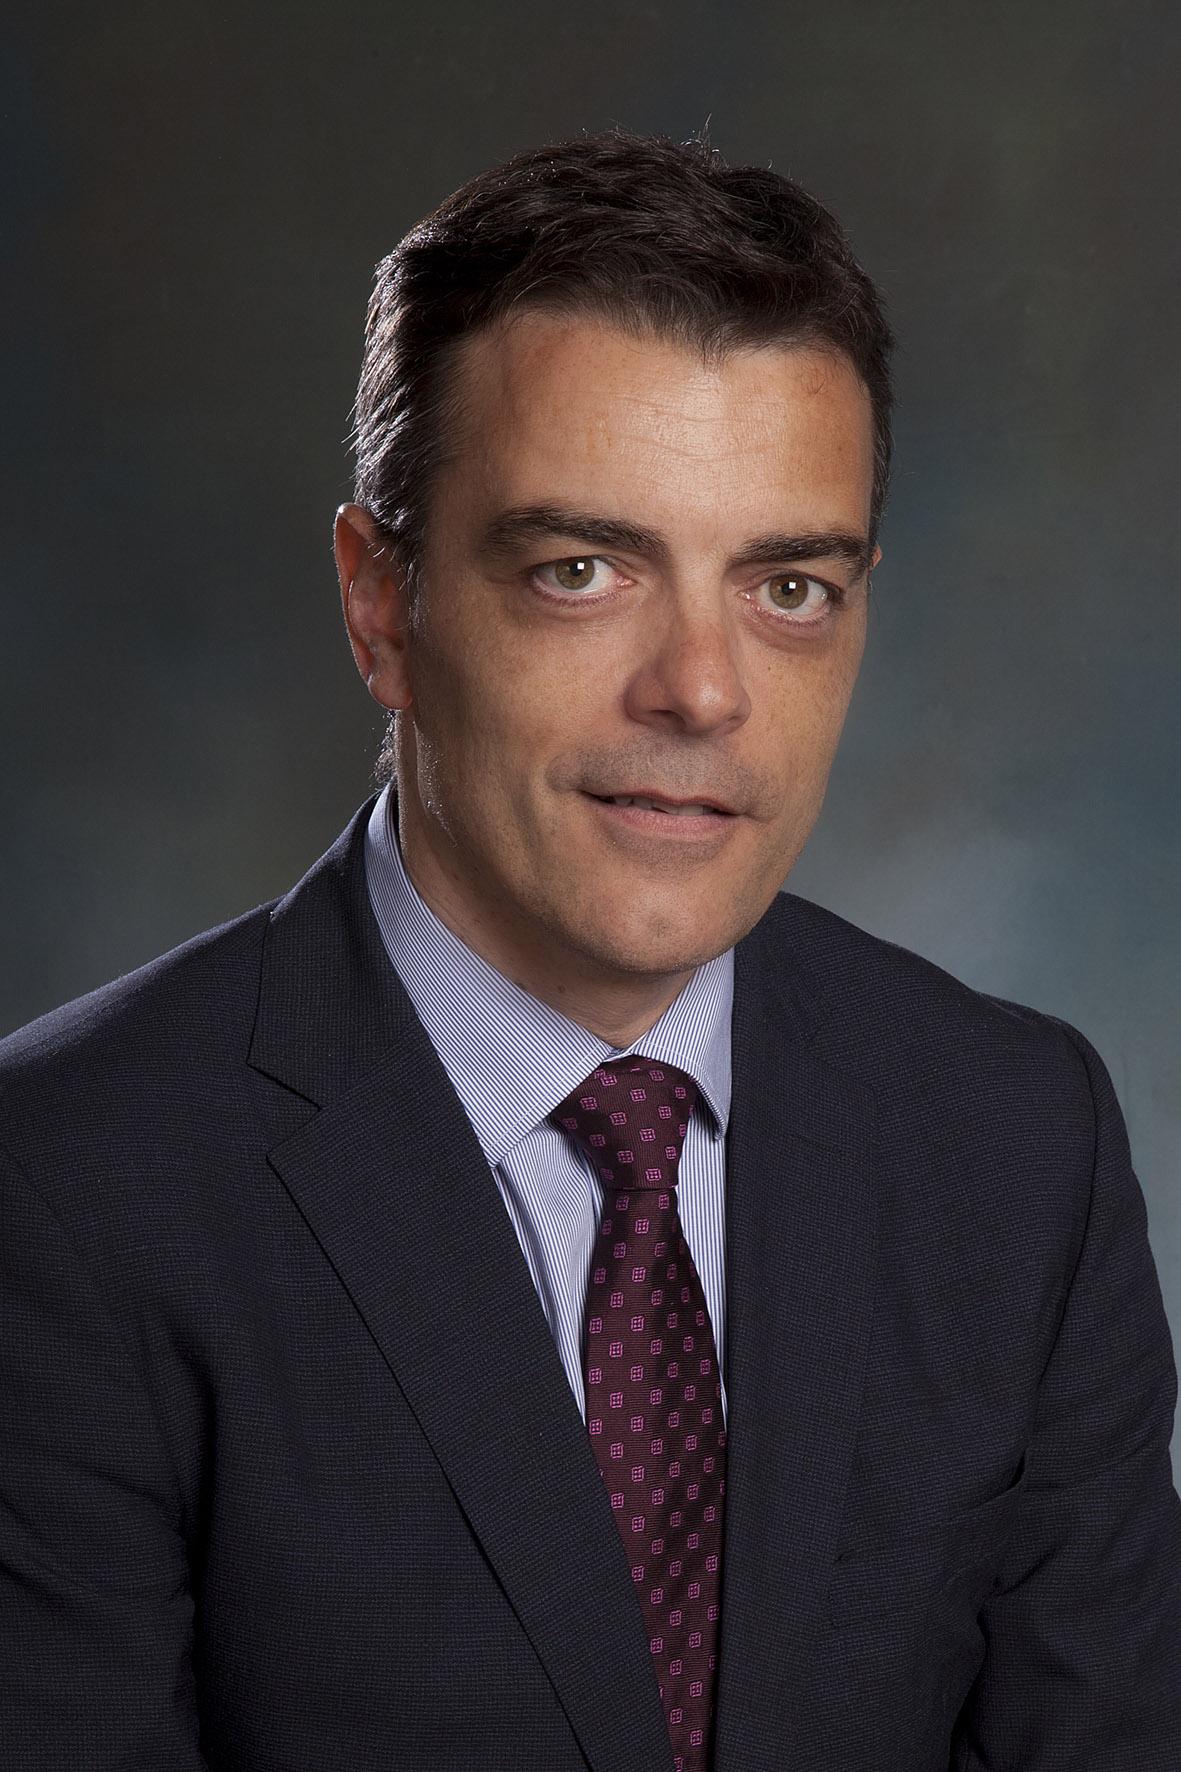 Albert Cunillera Martínez